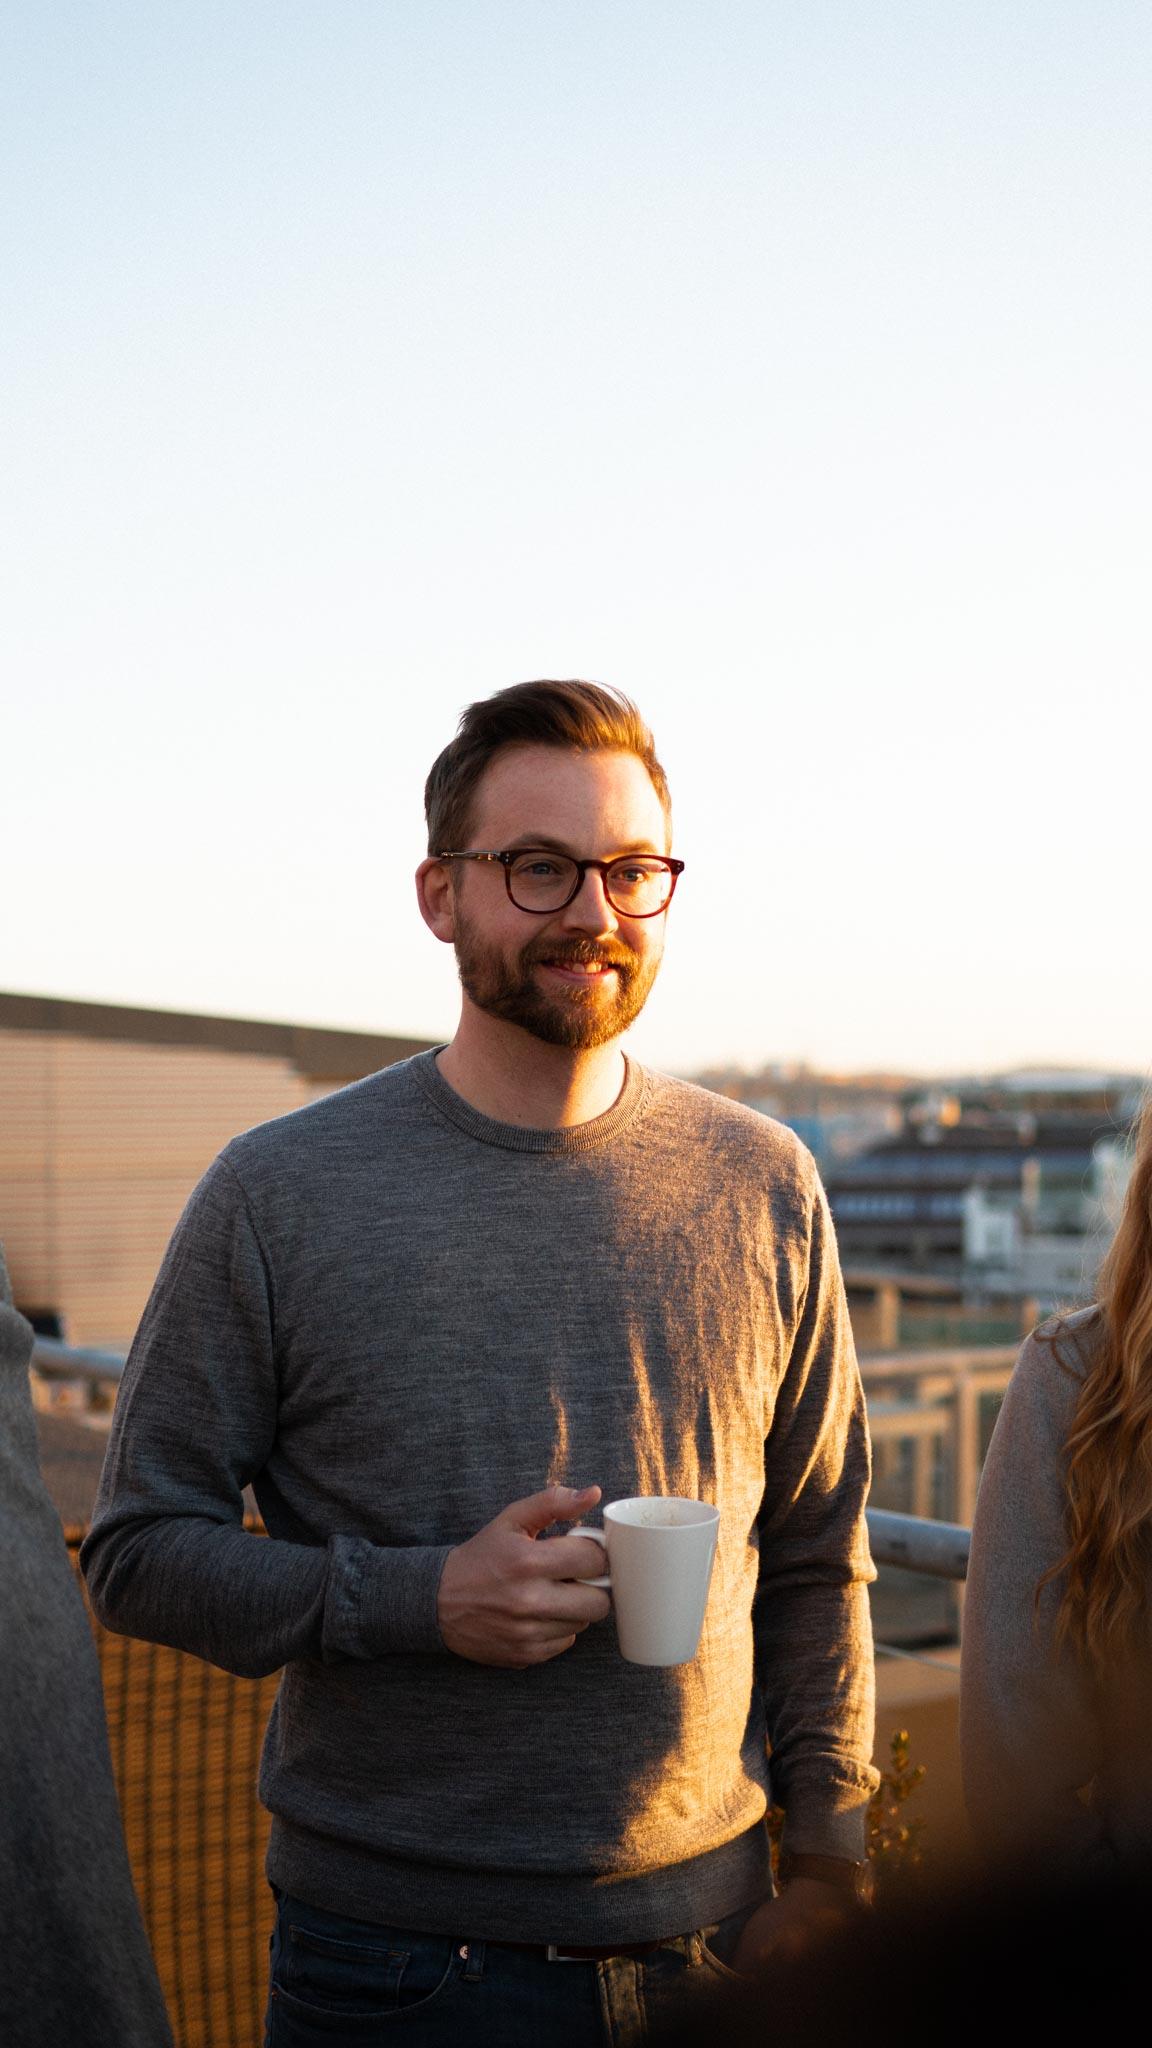 par wikberg drinking coffe on vinngroup rooftop